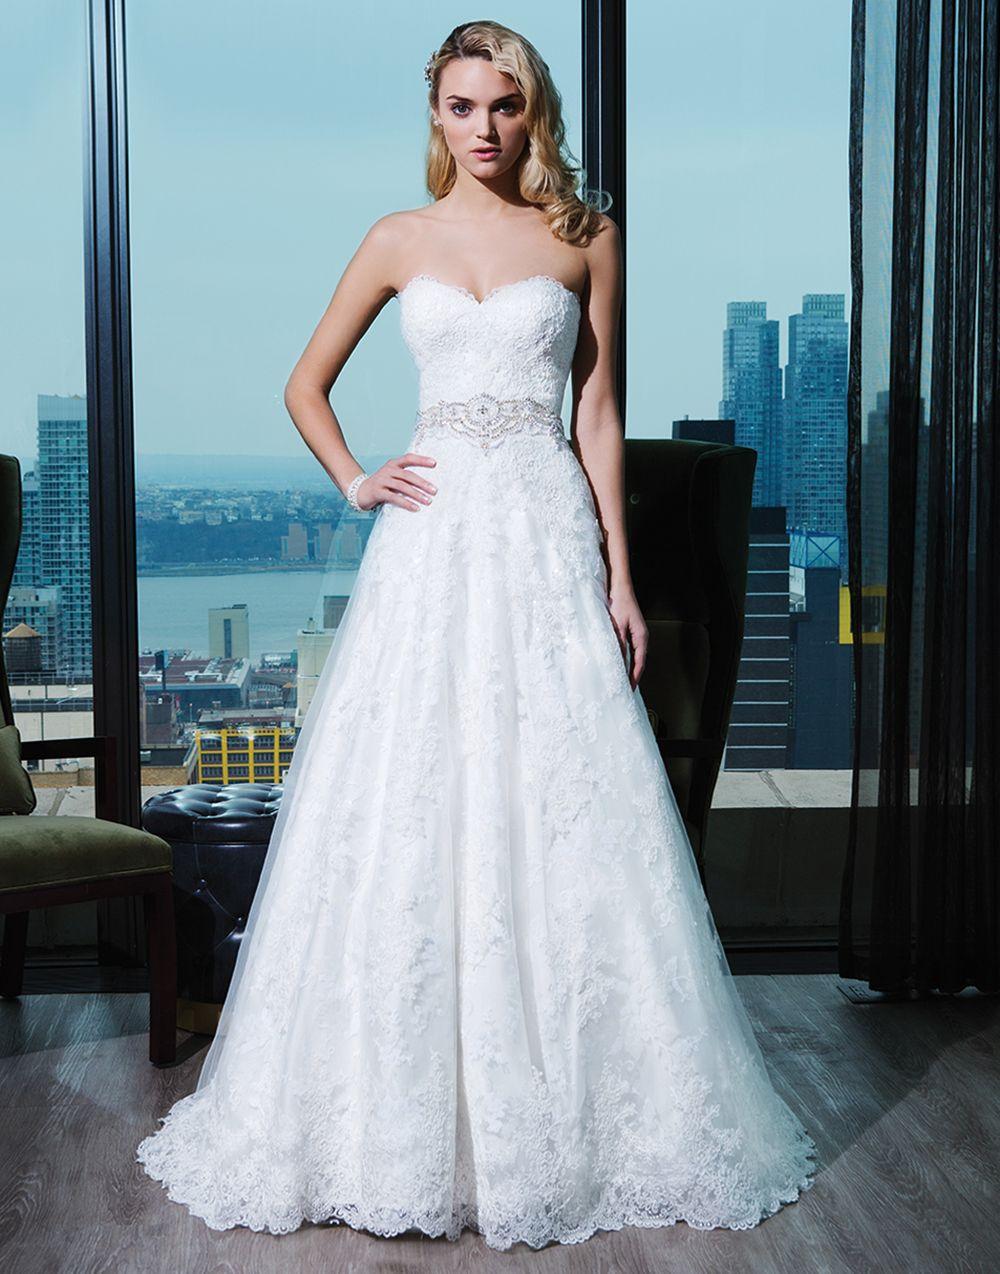 Justin alexander signature wedding dresses style lace ball